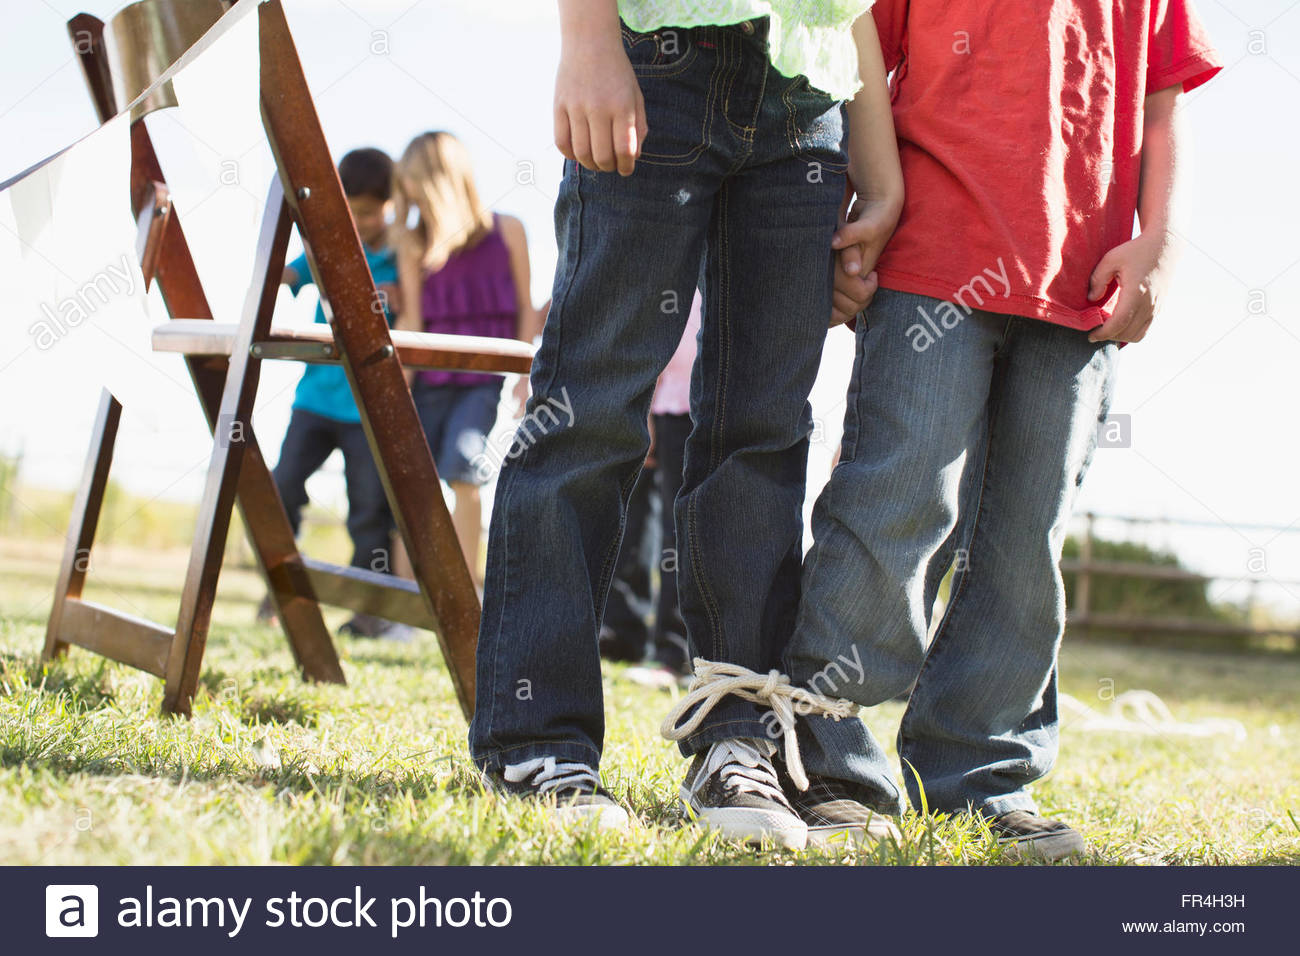 Bambini sempre pronti a competere in un 3 zampe gara. Immagini Stock